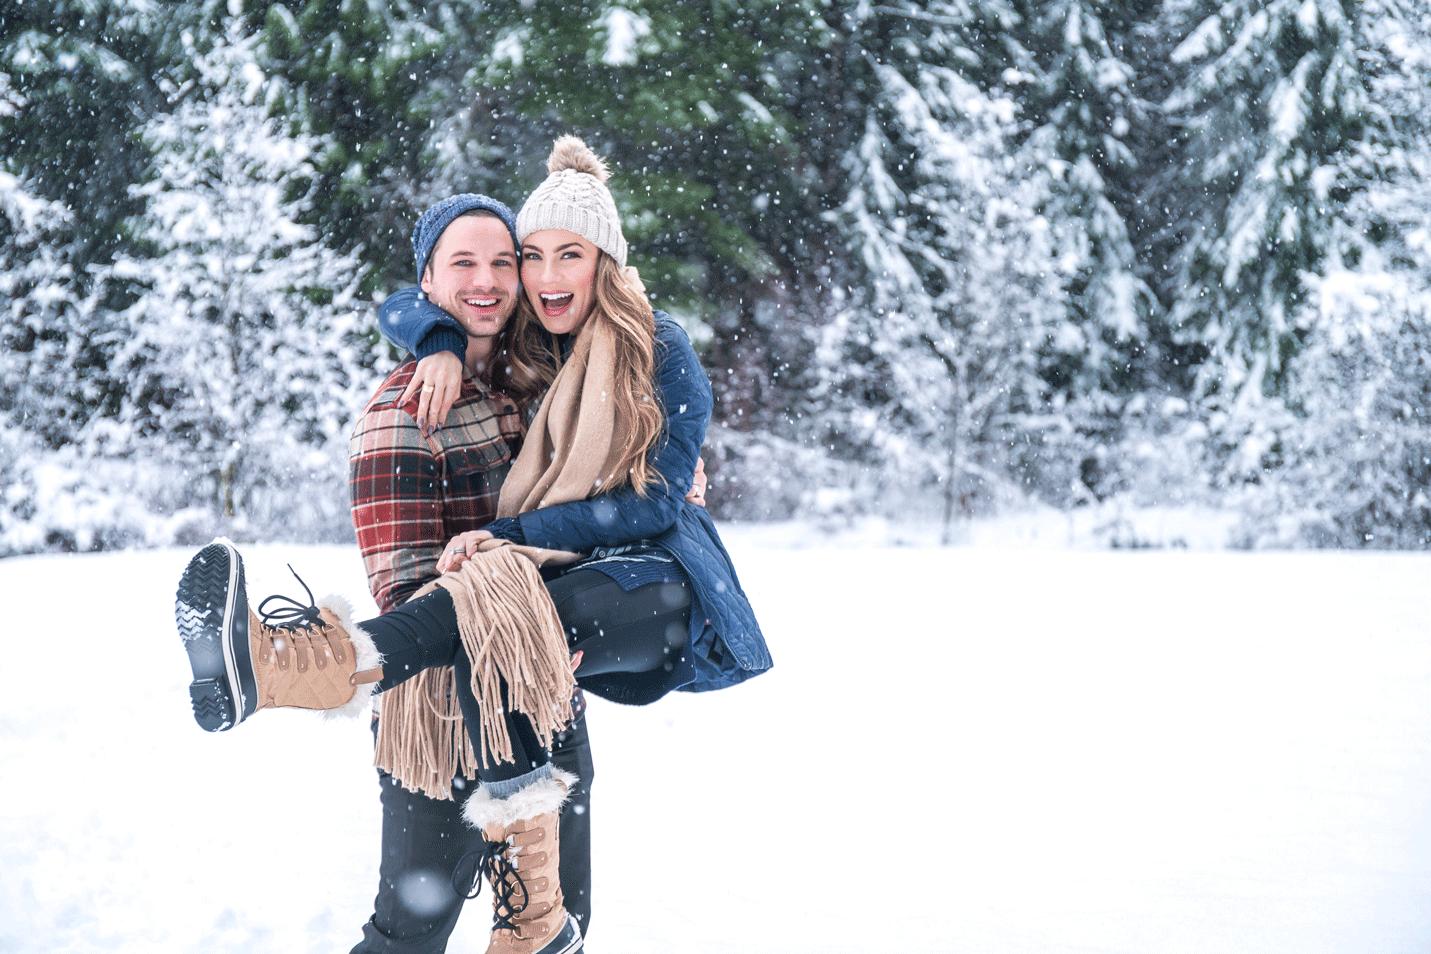 Matt & Angela Lanter Christmas Card 2016